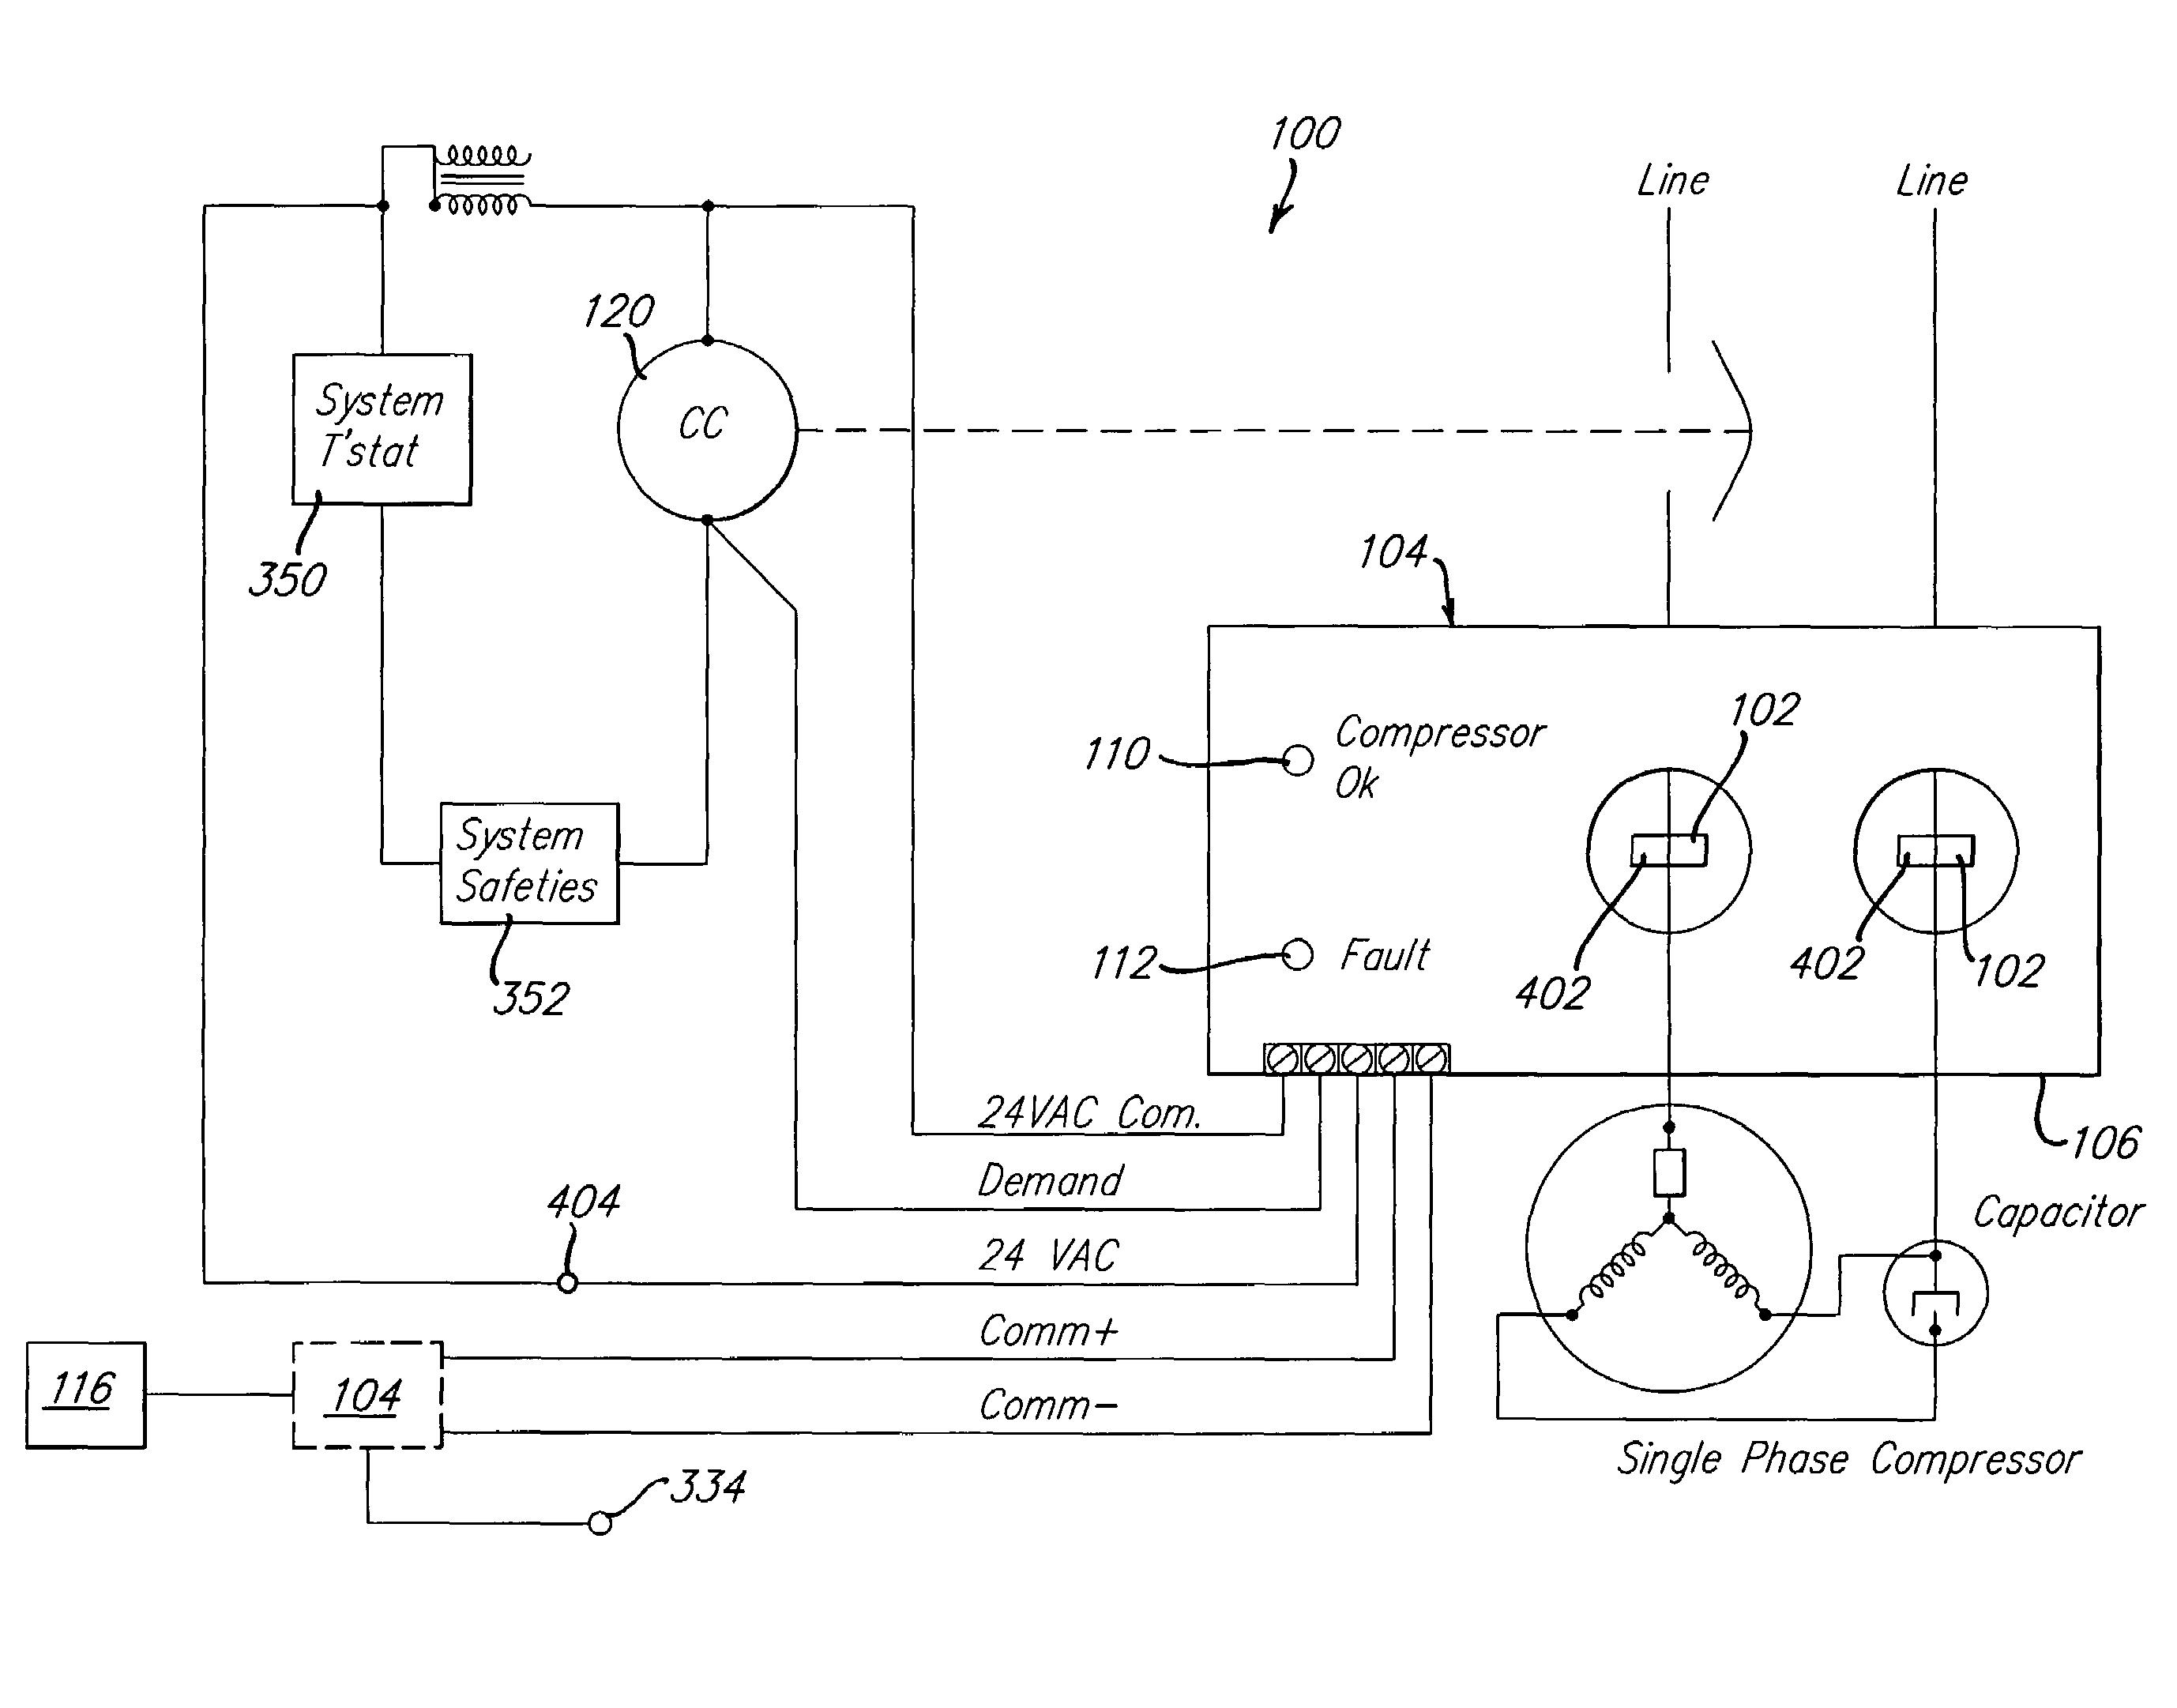 samsung dryer wiring diagram ea 4417  diagram parts list for model dv405etpasuaa0000 samsung dryer wiring schematic ea 4417  diagram parts list for model